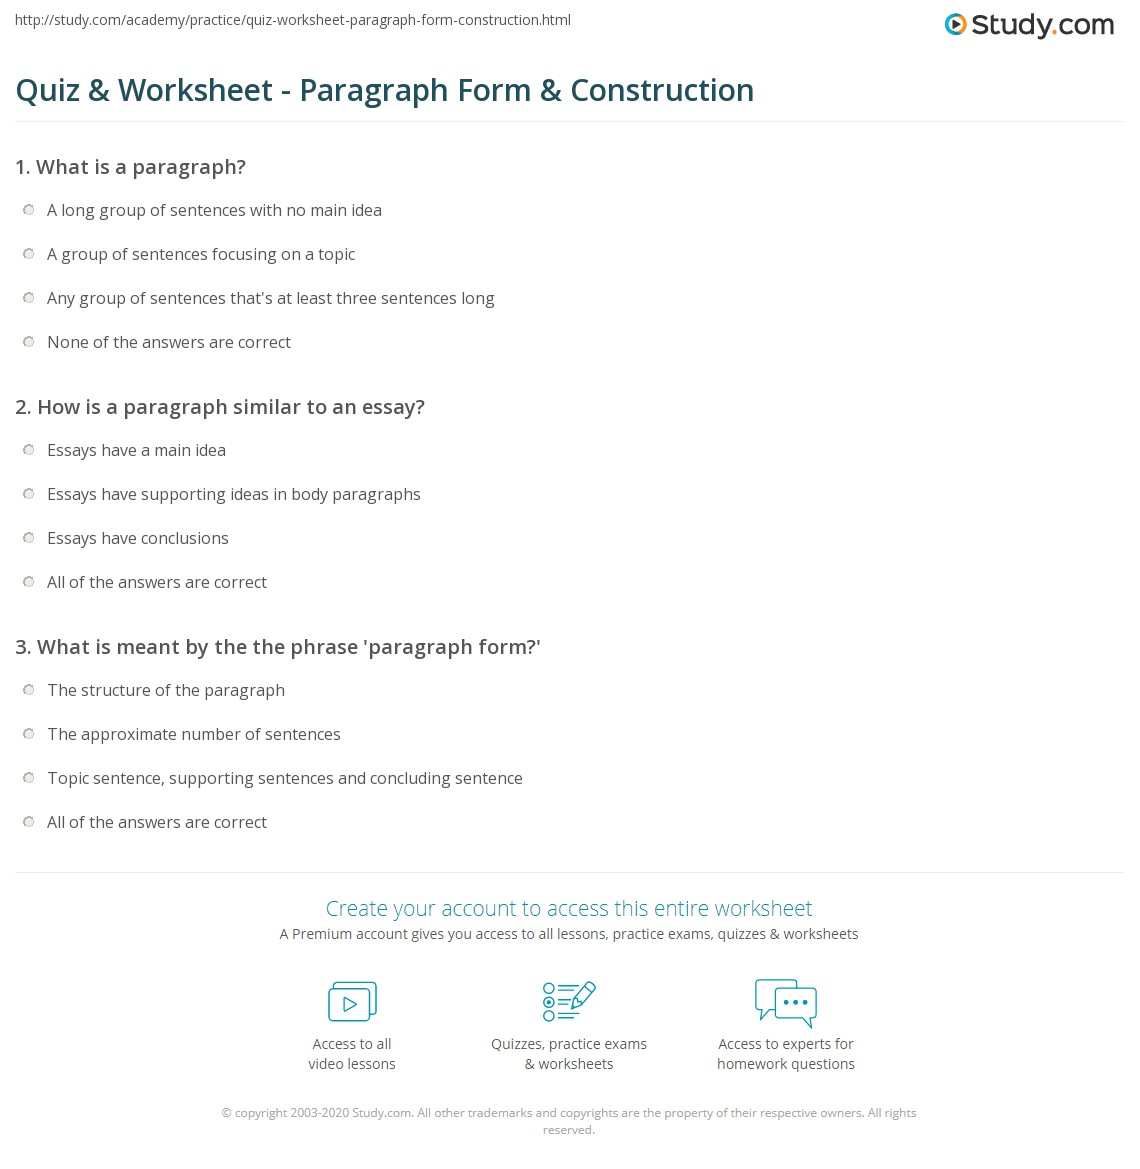 hight resolution of Quiz \u0026 Worksheet - Paragraph Form \u0026 Construction   Study.com